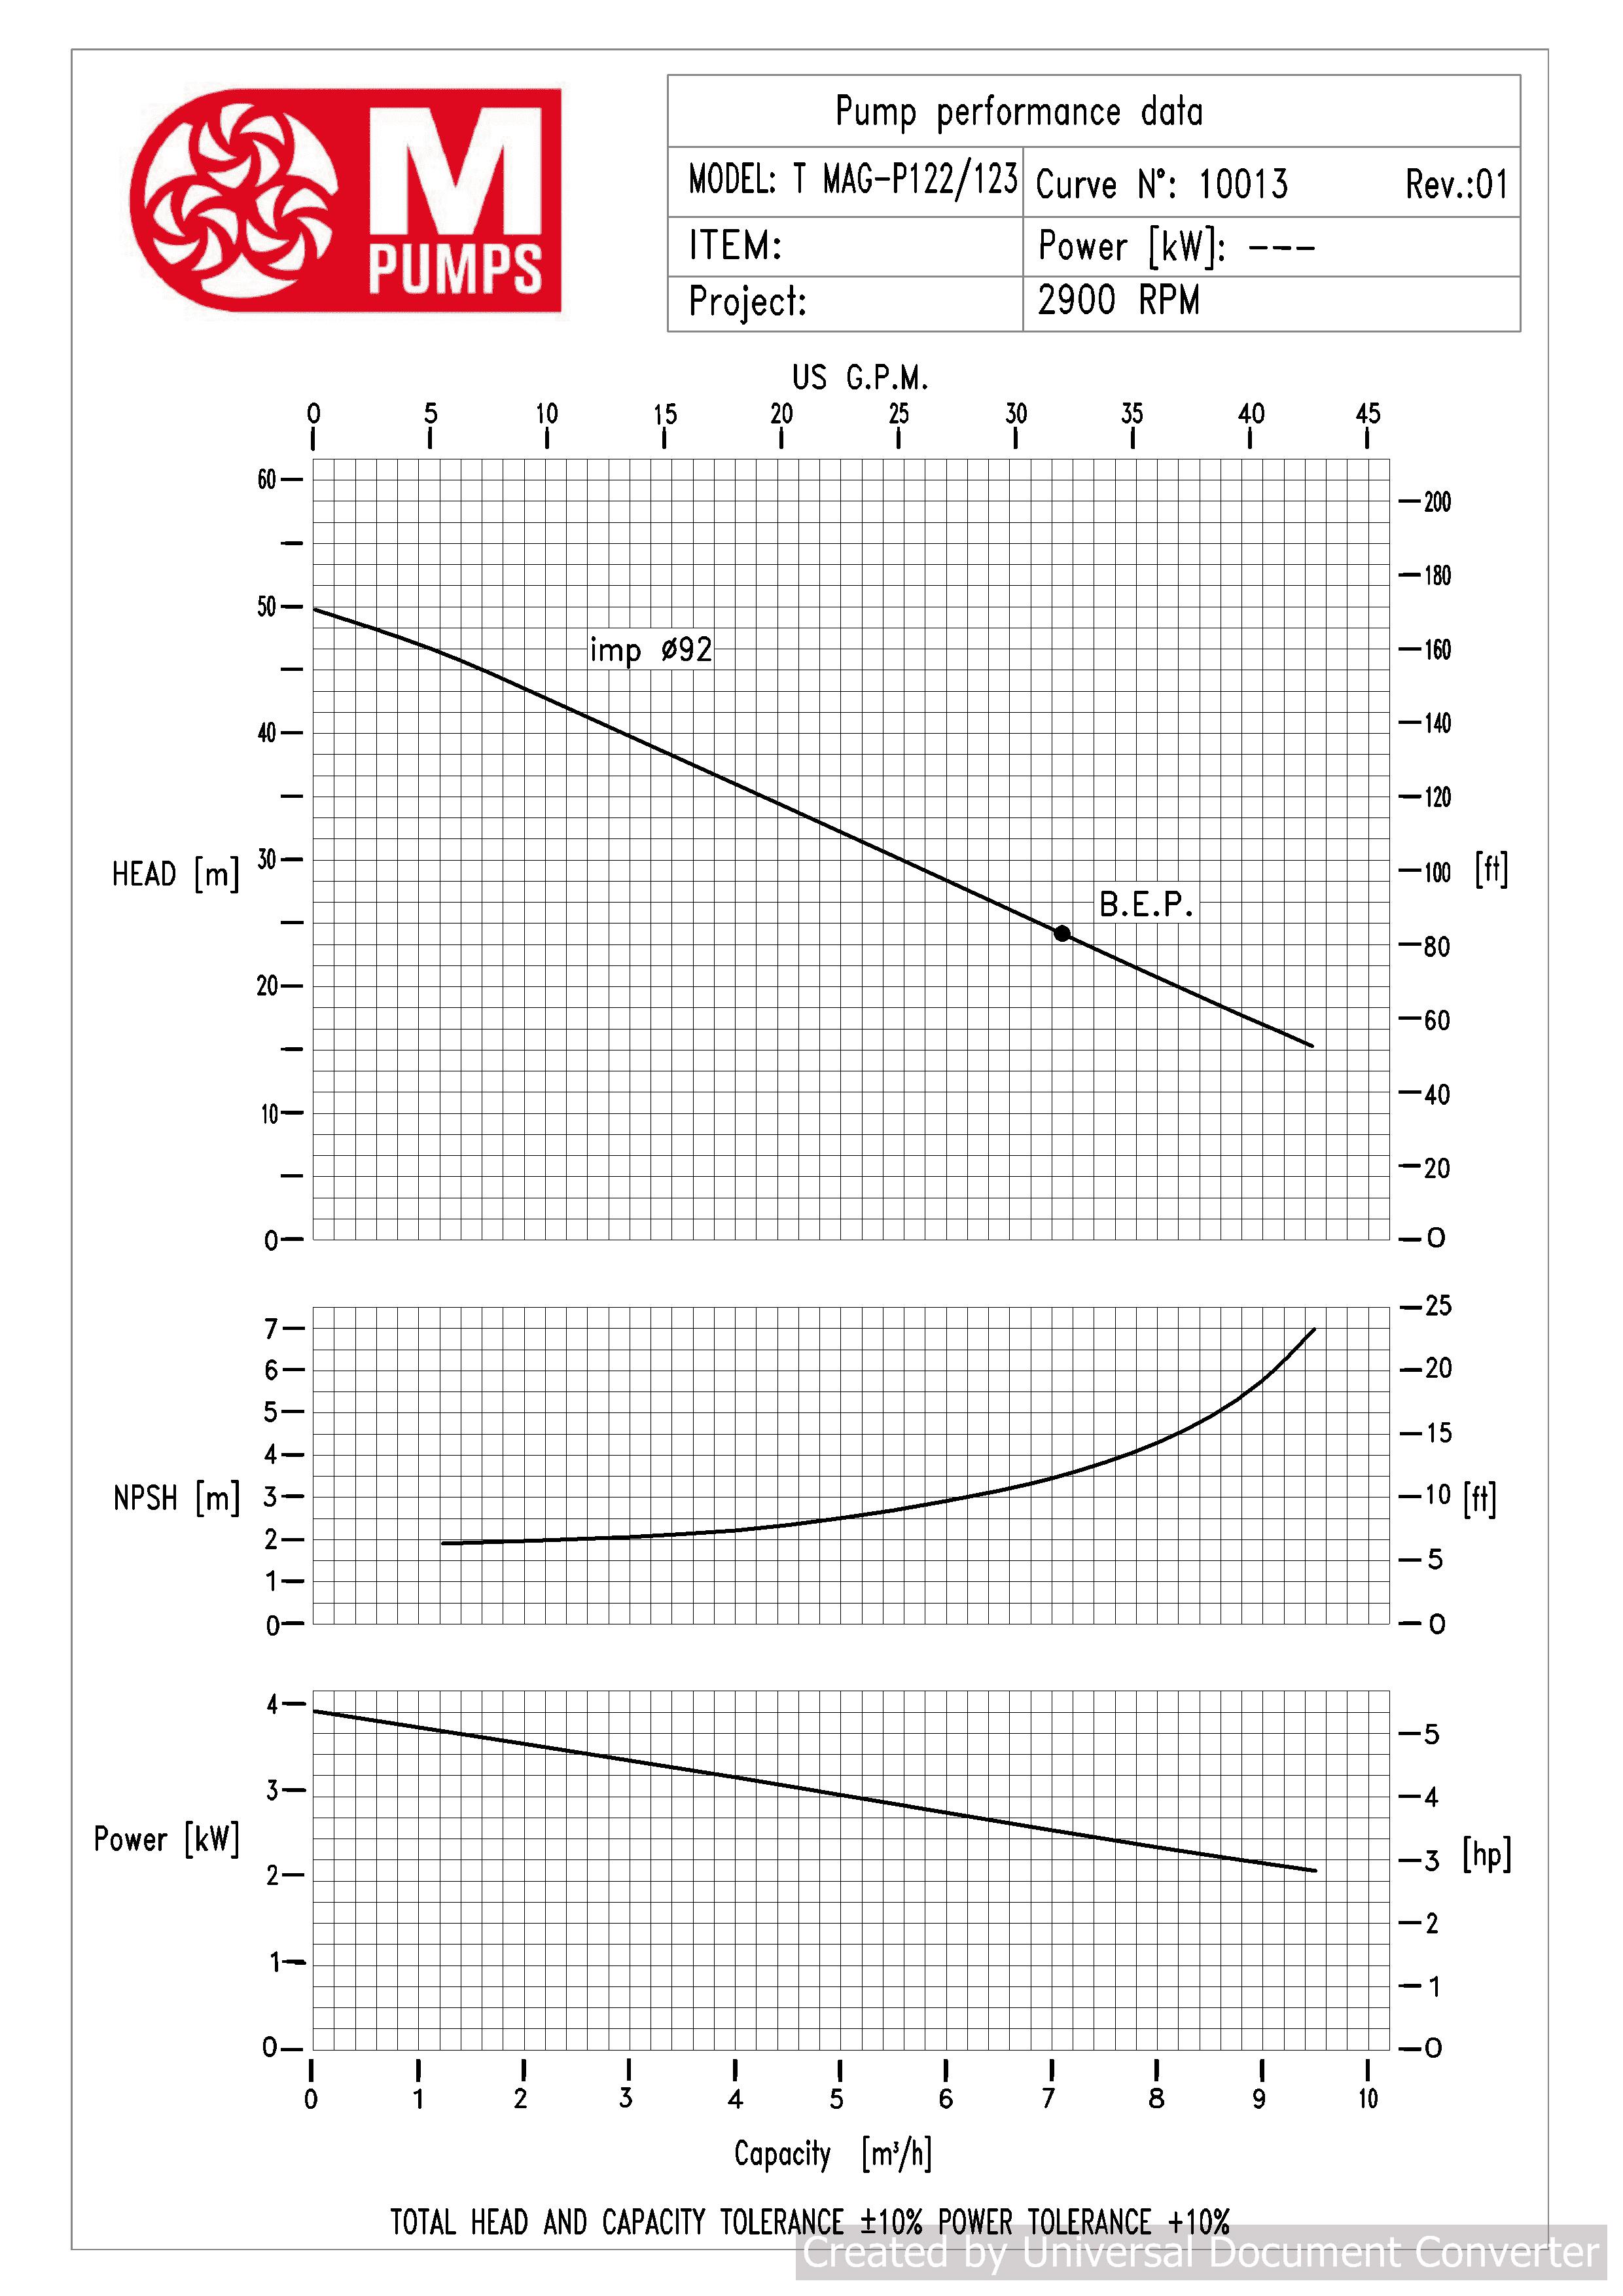 кривая t-mag-p-122